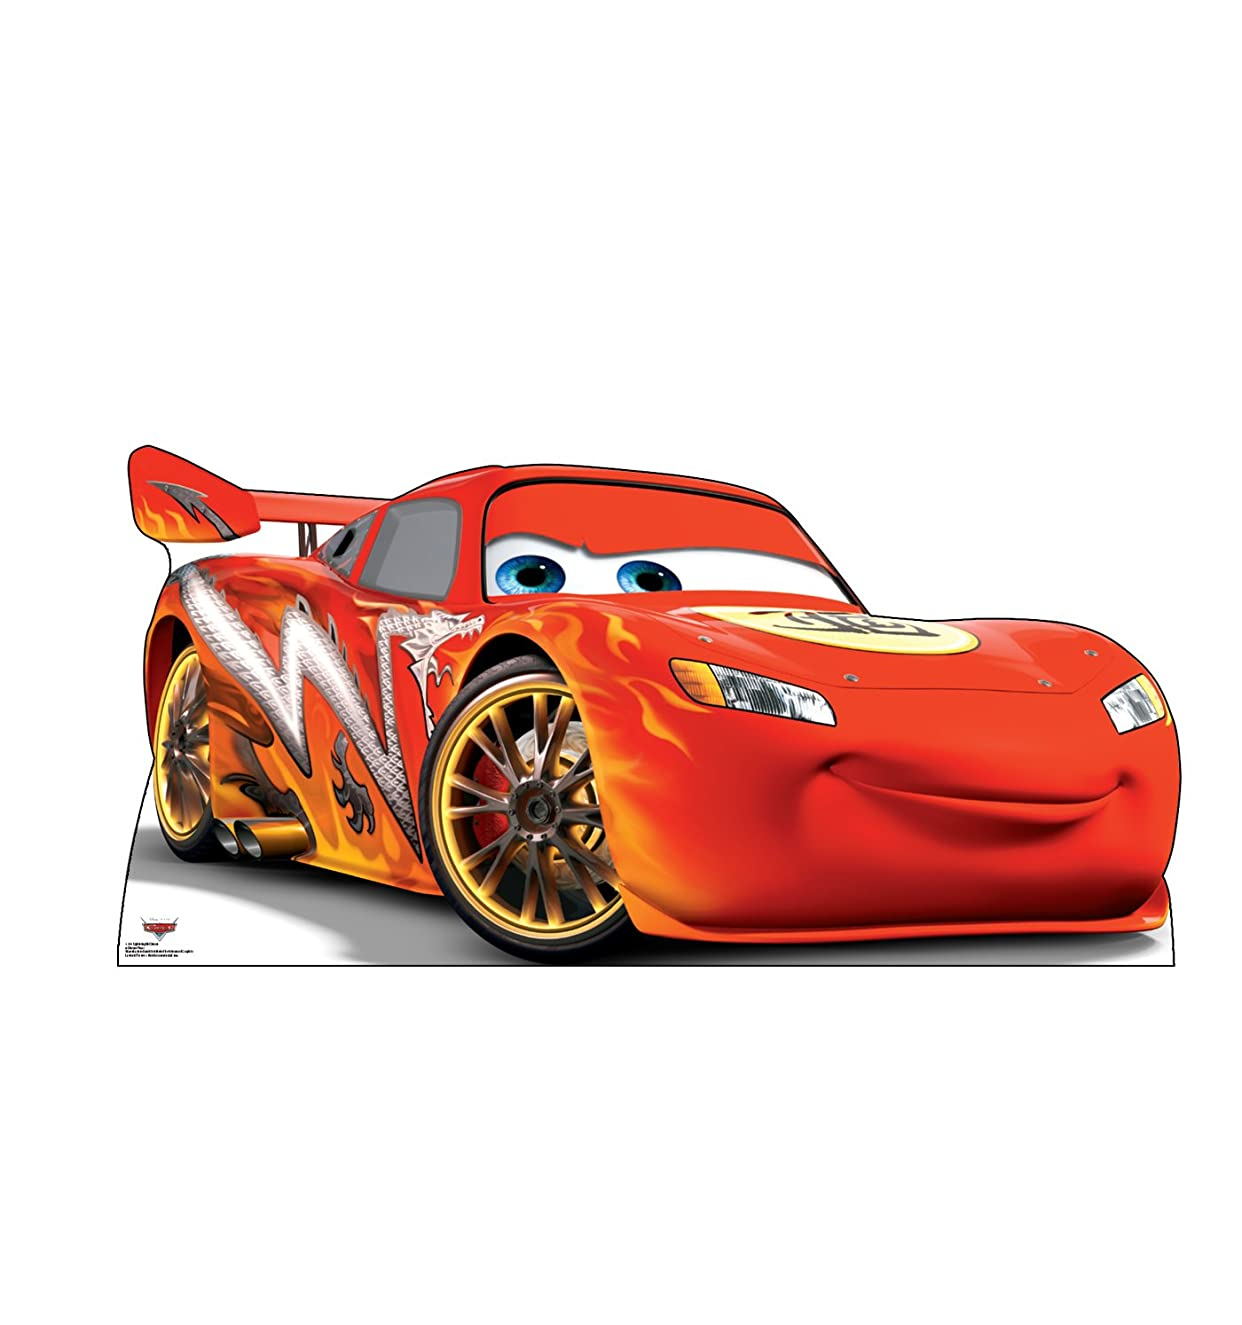 Advanced Graphics Lightning McQueen Life Size Cardboard Cutout Standup - Disney Pixar's Cars